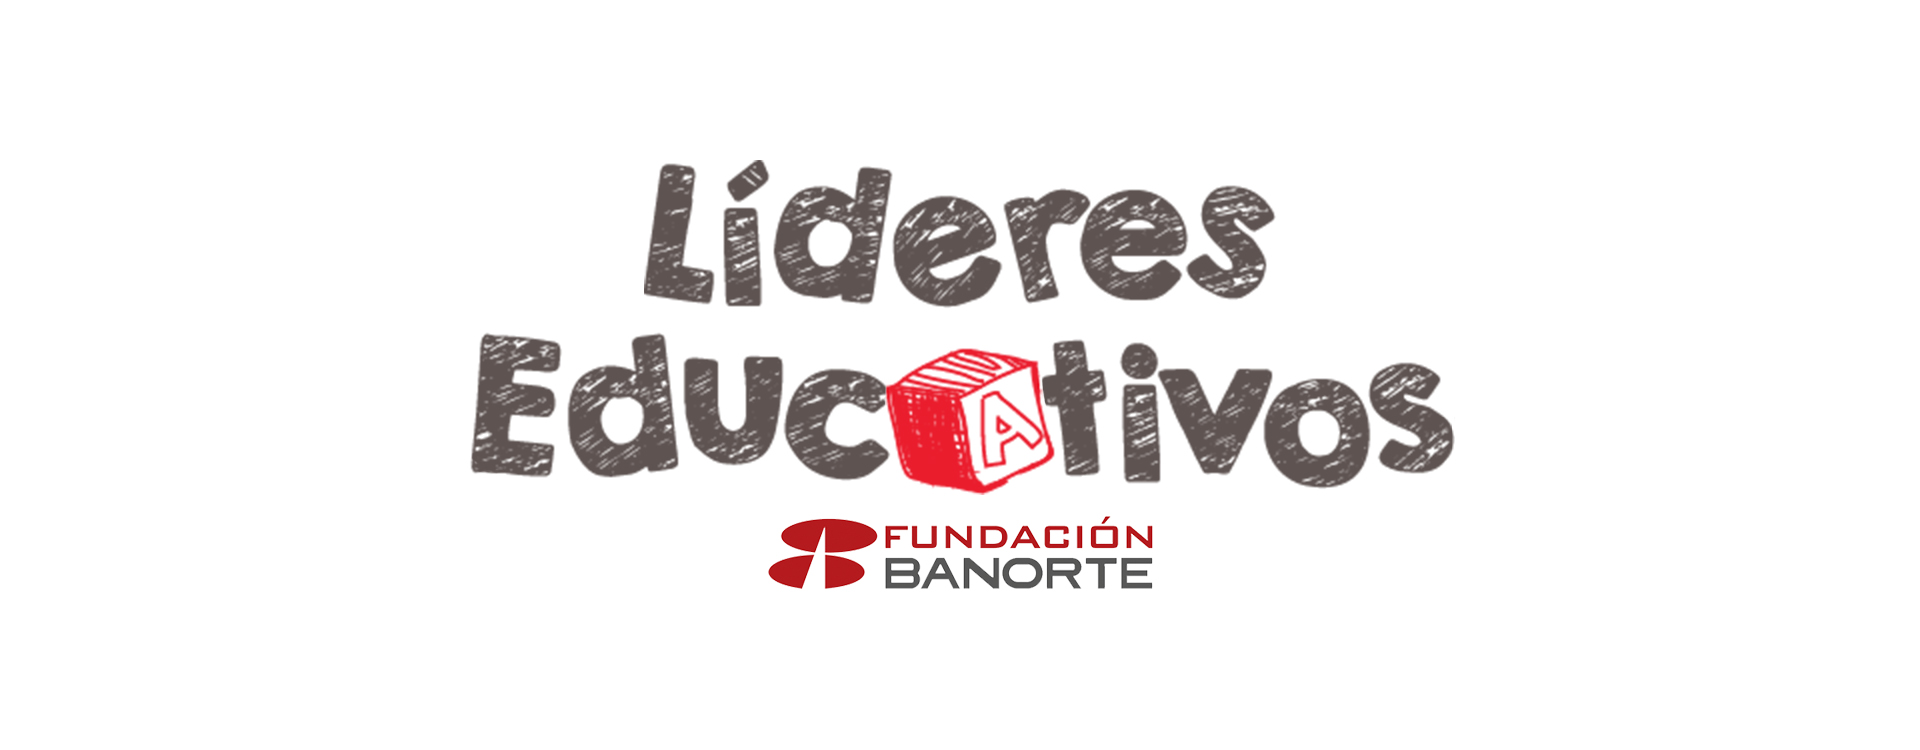 FUNDACIÓN_BANORTE-LOGO